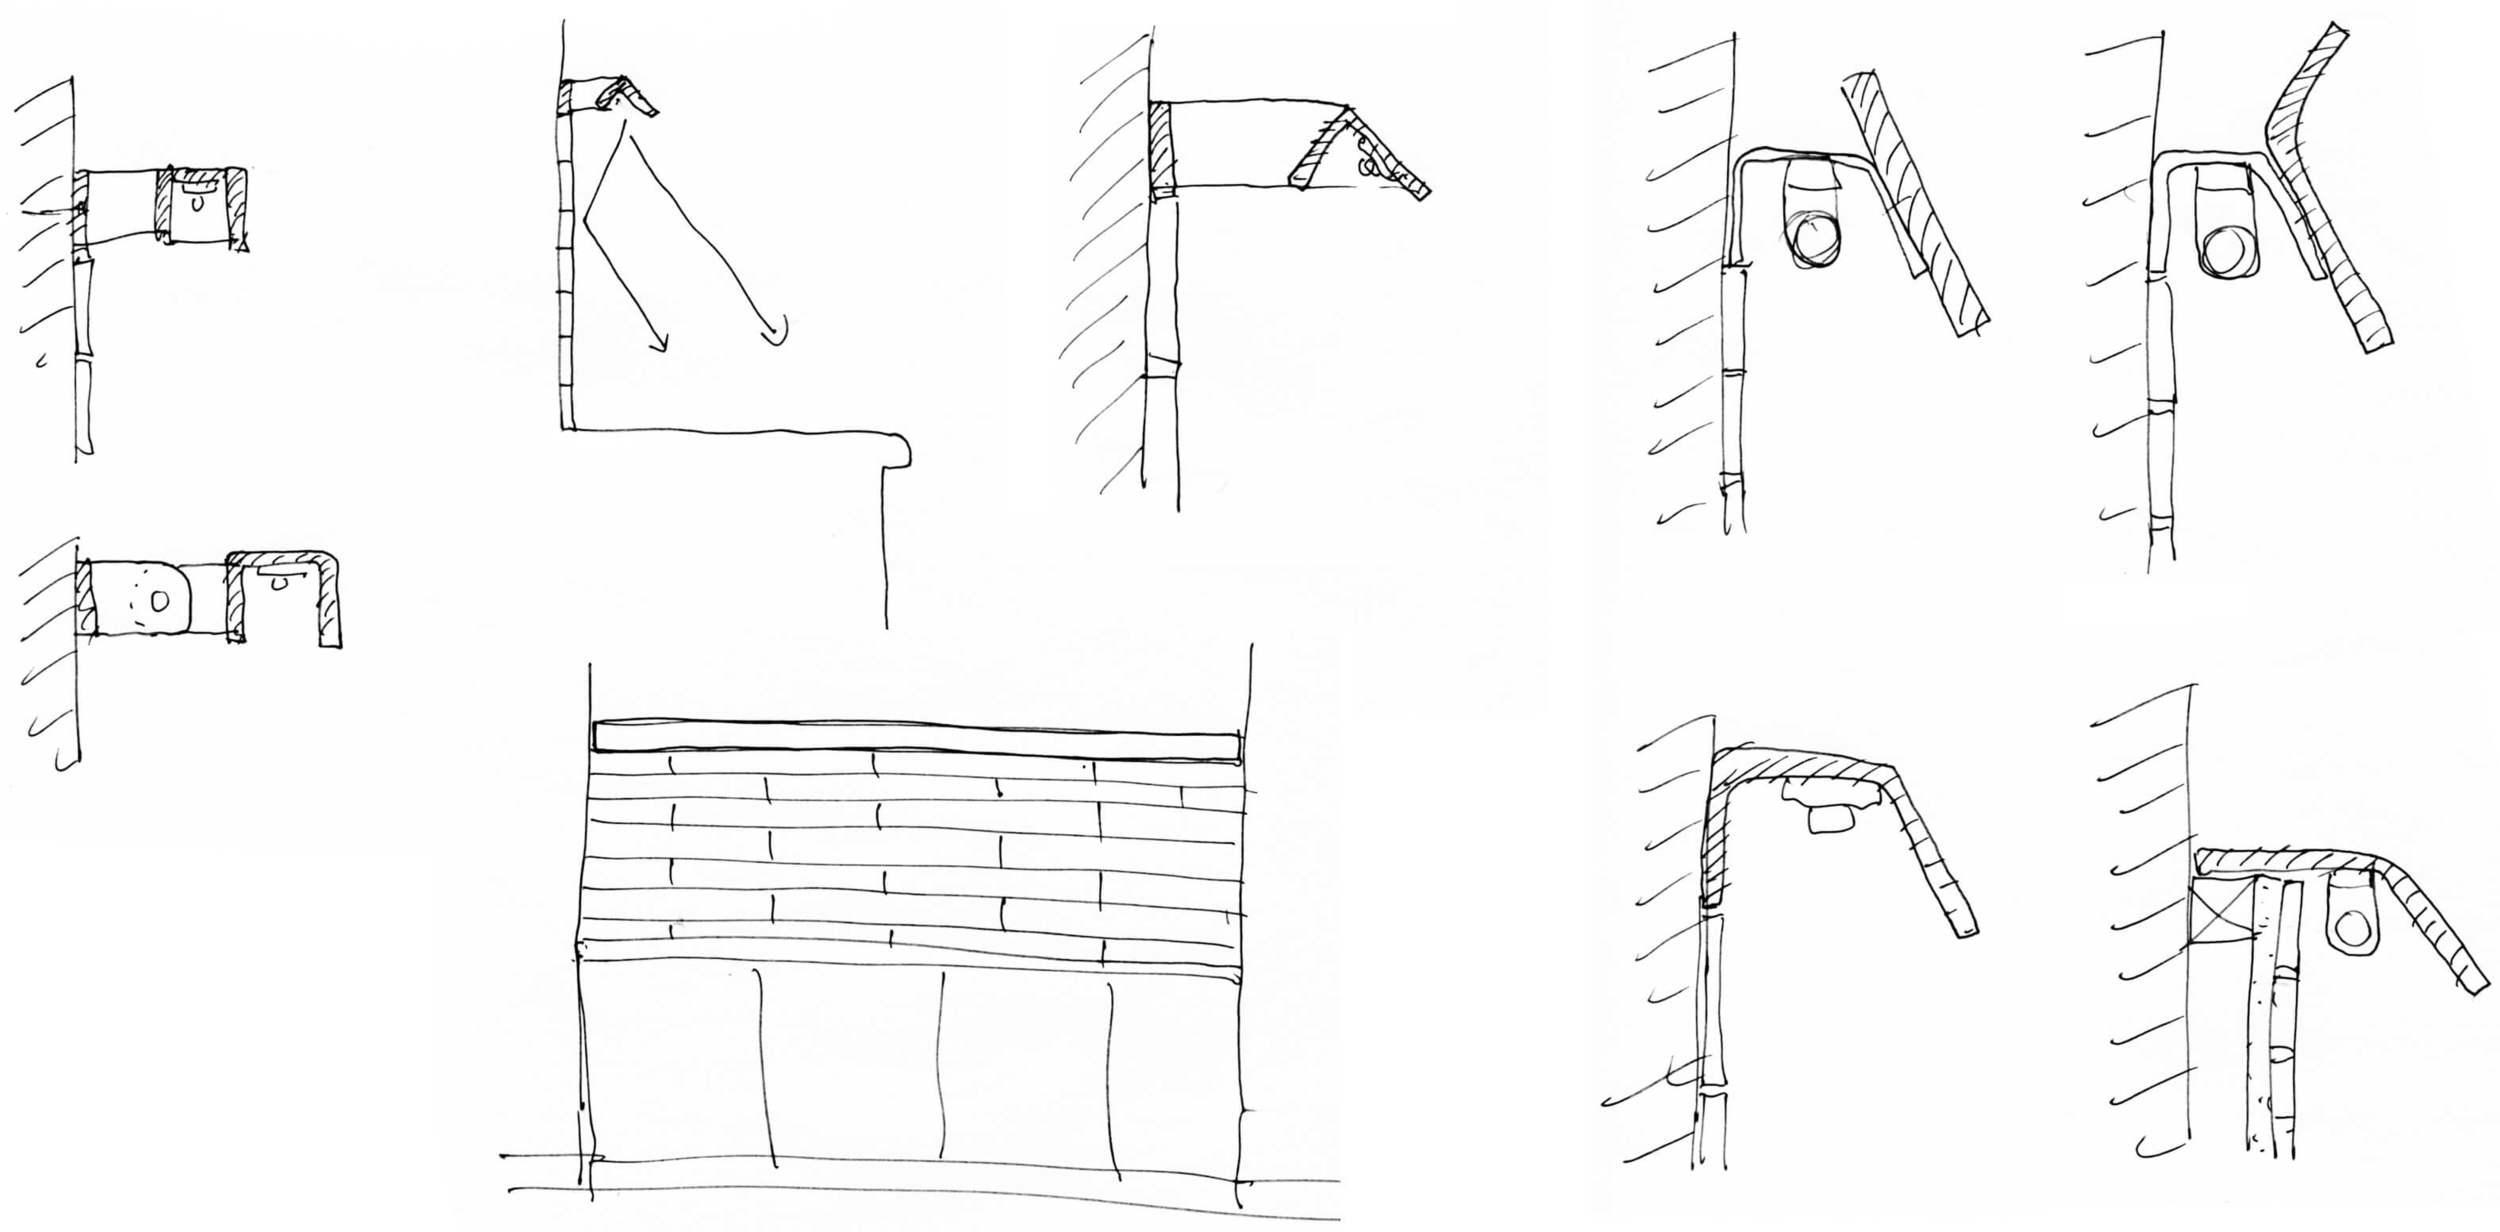 Bloomsbury-house-bizley-listed-retrofit-passivhaus-brass-wall-light-sketches.jpg